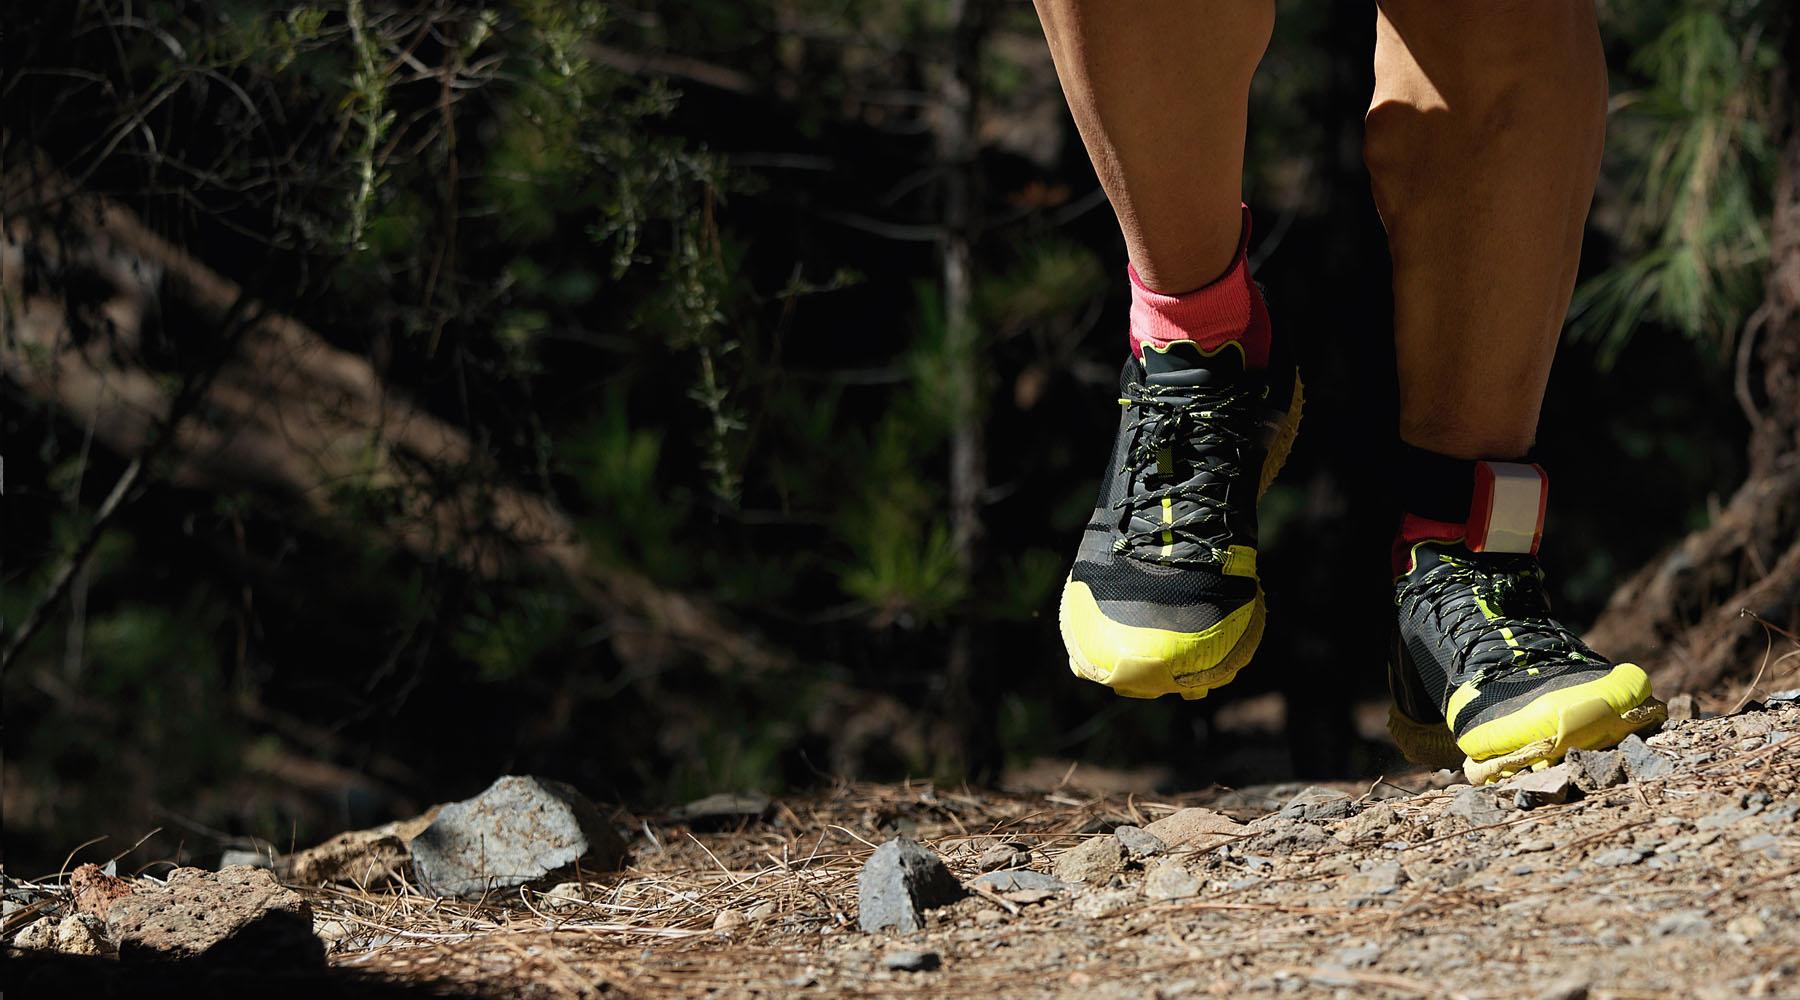 posturologia ortopedia lecce maglie footcare asl